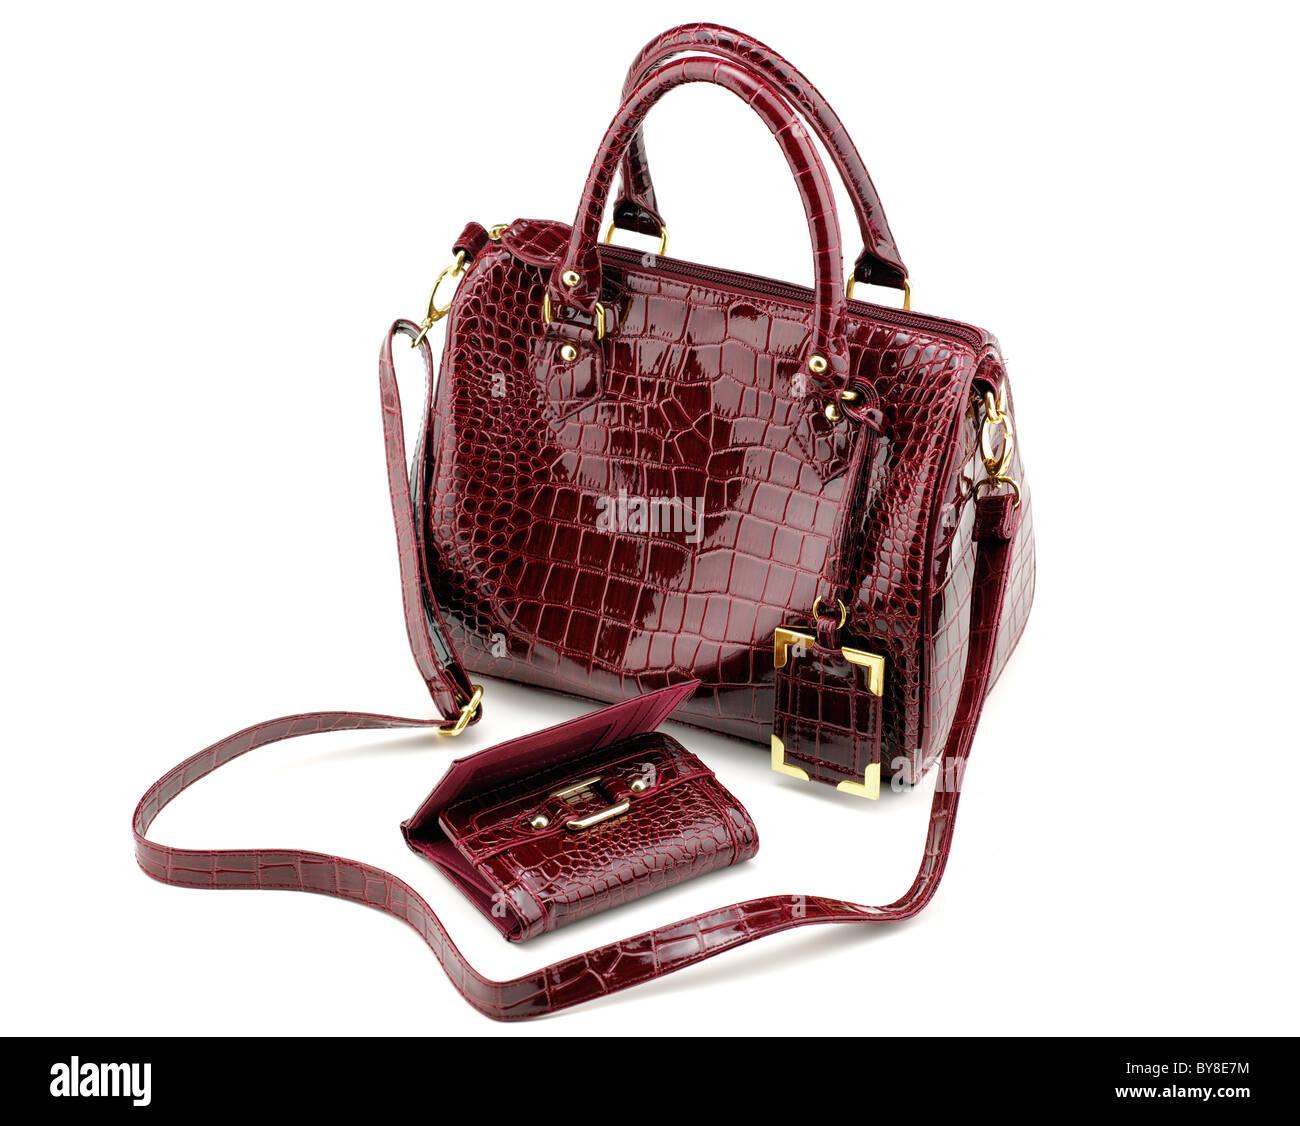 maroon imitation  leather handbag and matching purse - Stock Image